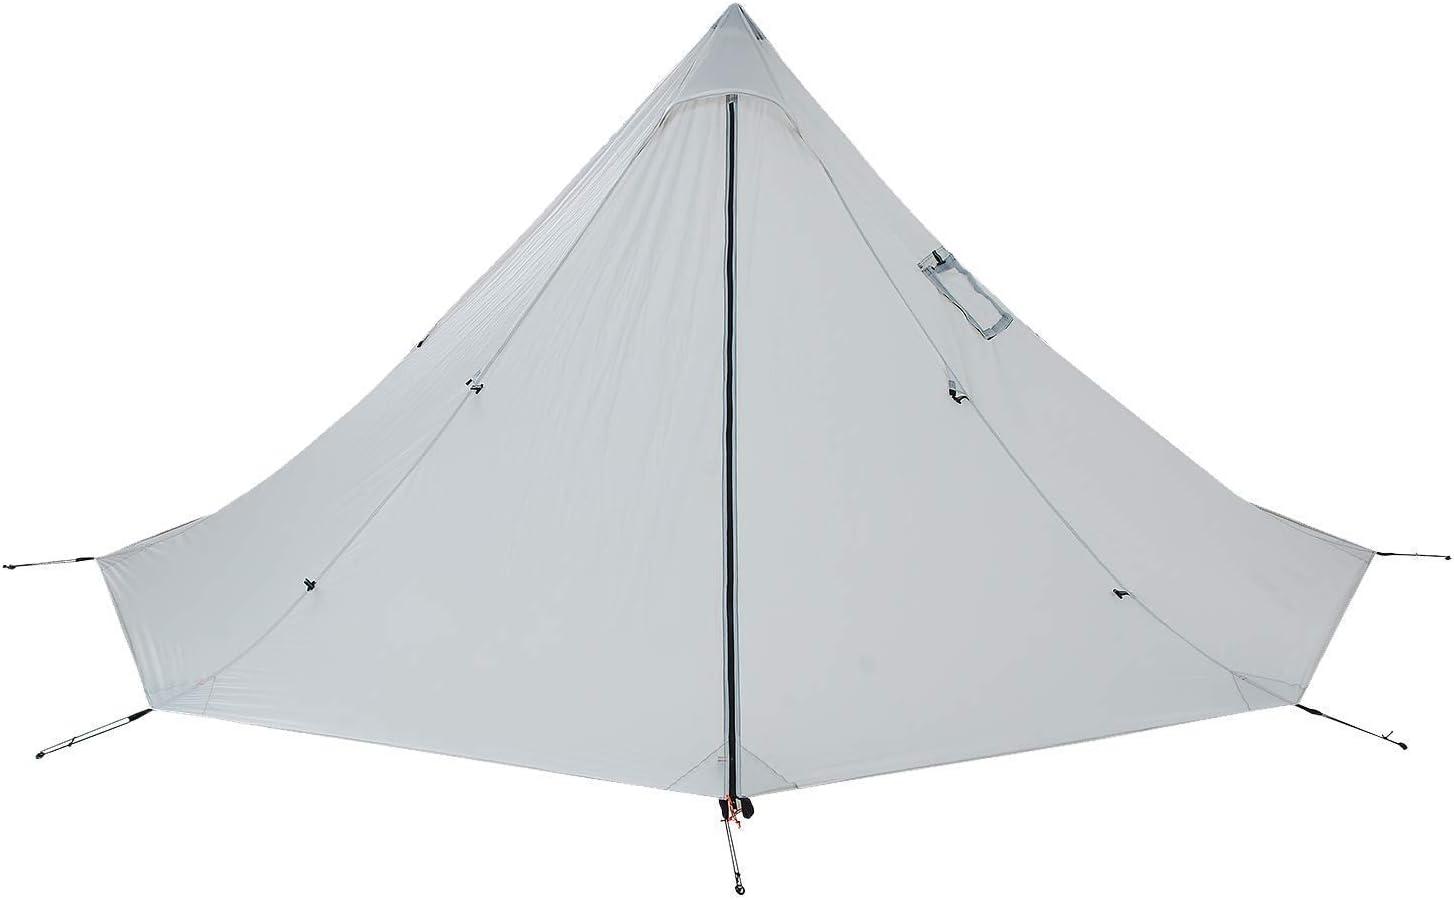 Hedendaags Amazon.com : OneTigris Smokey HUT Ultralight Hot Tent, Weighs 2.6 MO-47